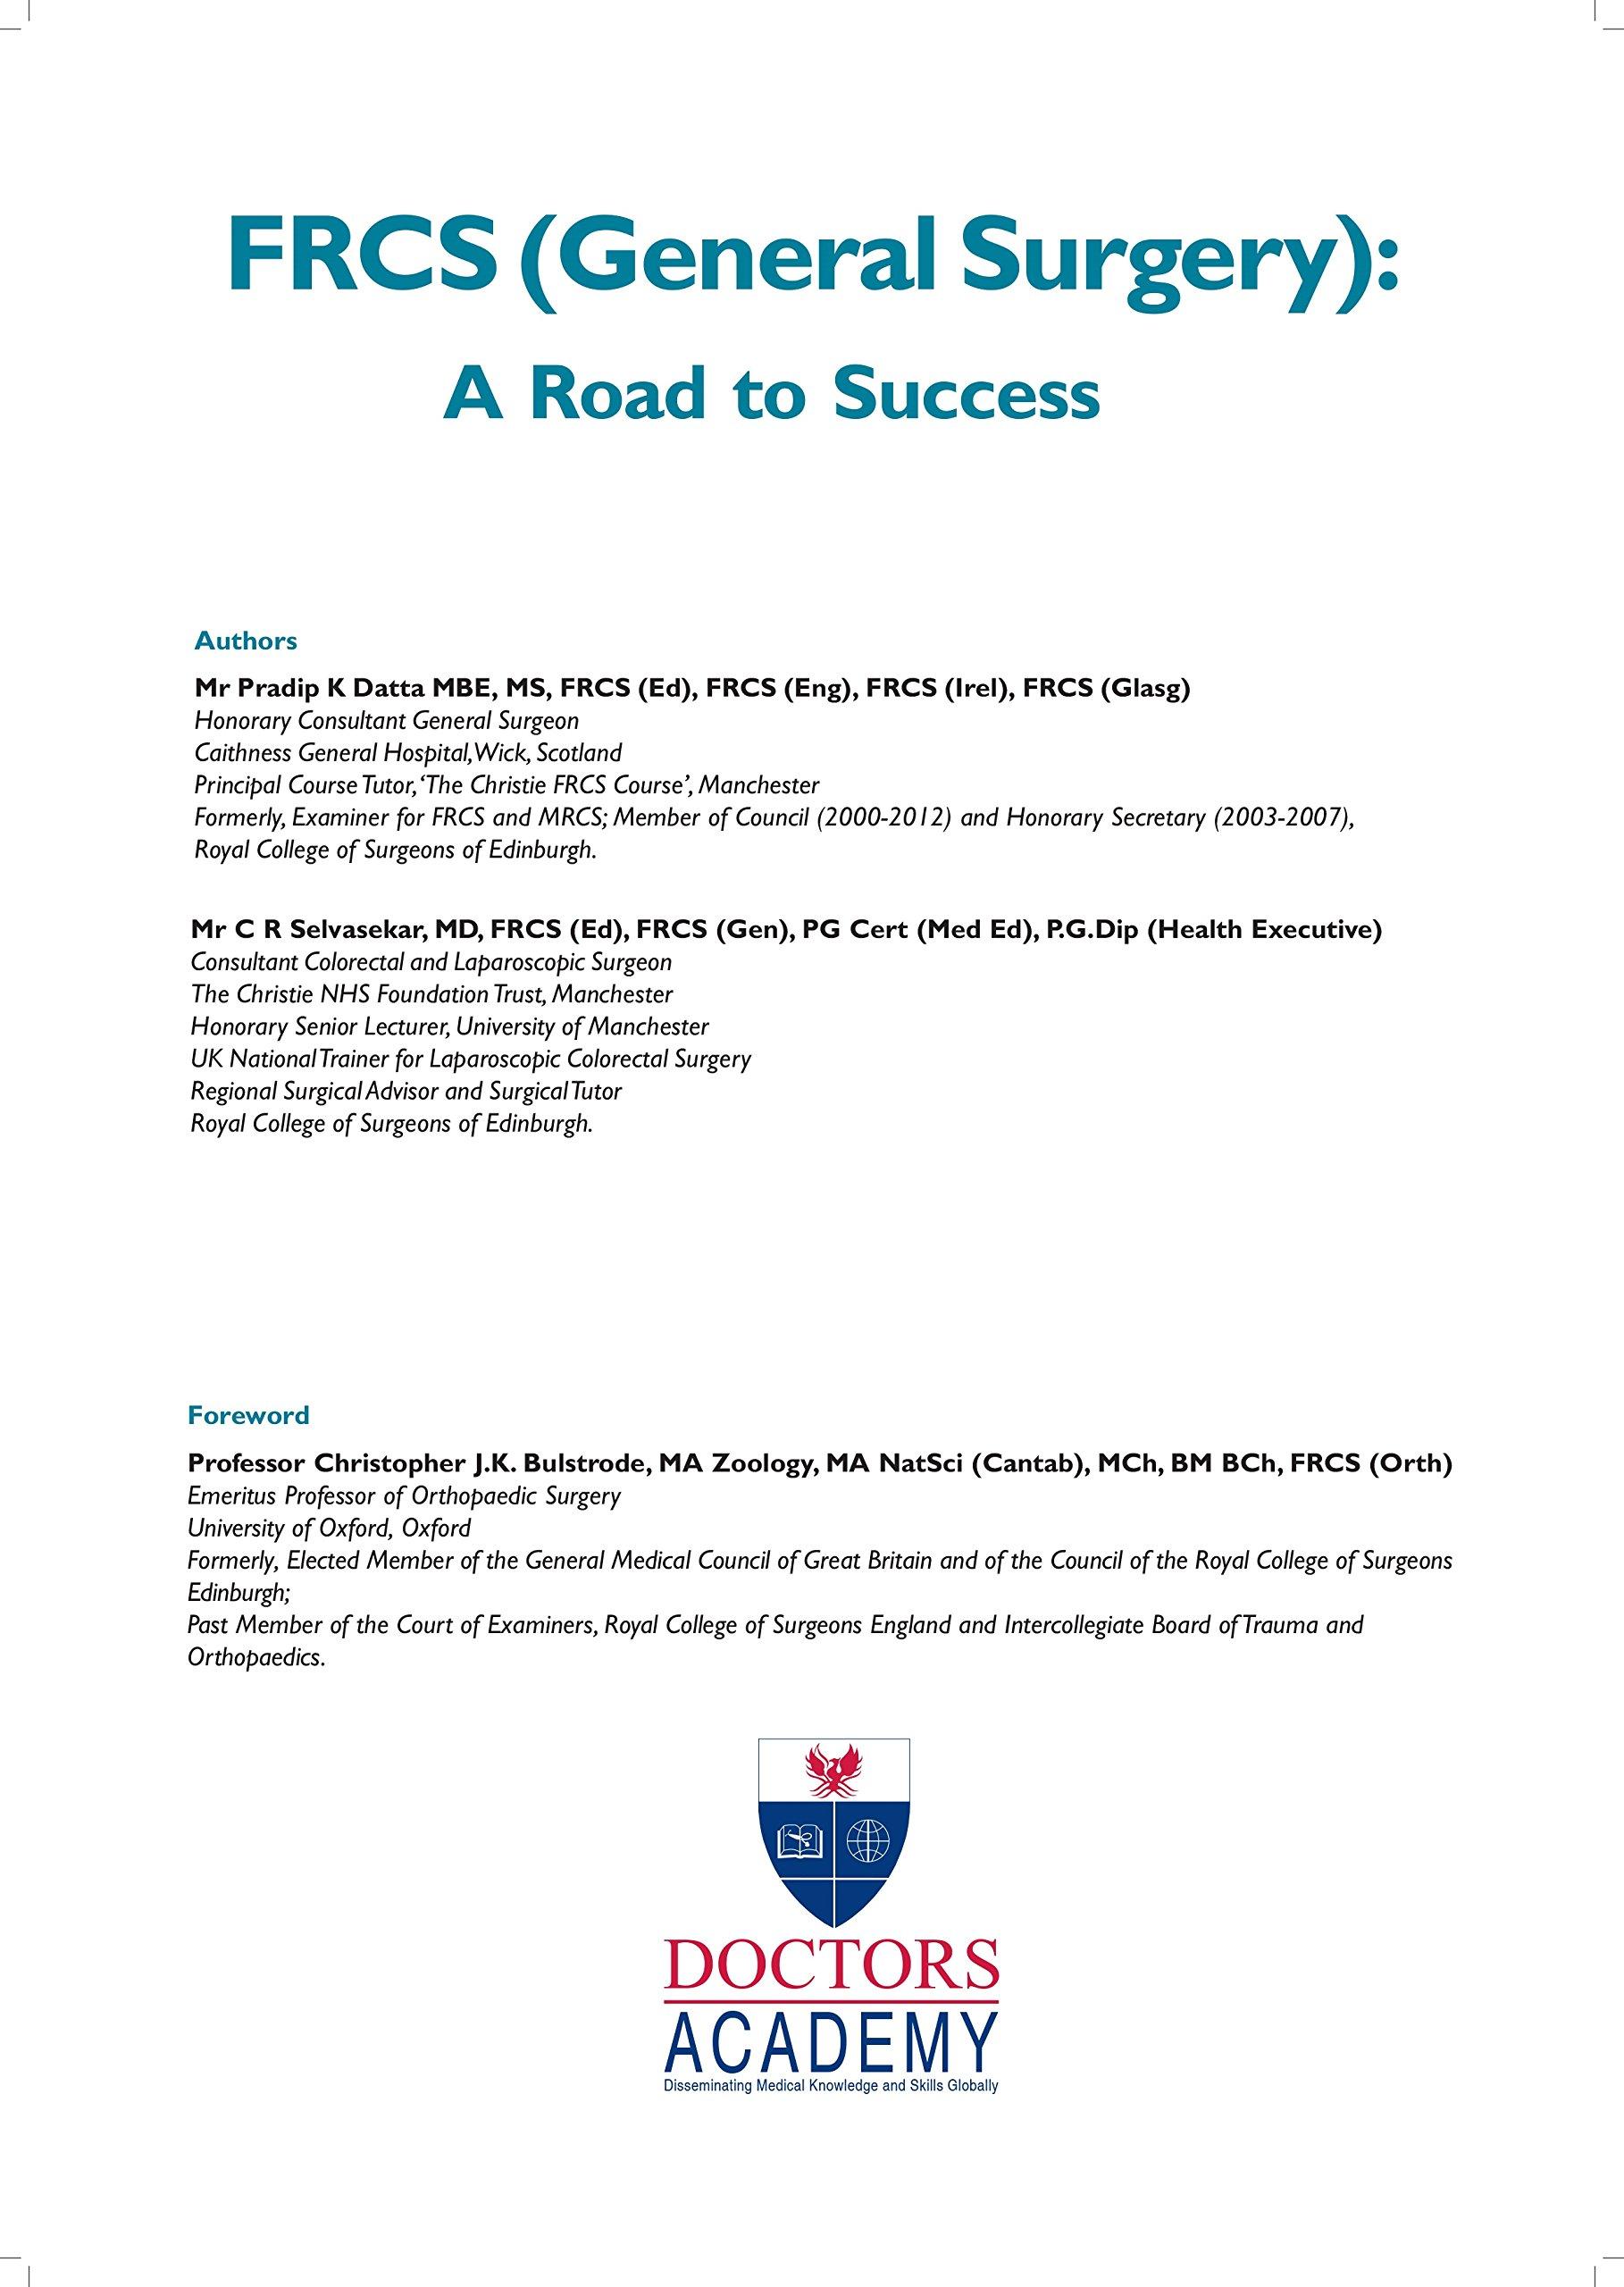 FRCS (General Surgery): A Road to Success: Traveller Location.uk: Mr Pradip K Datta  MBE MS FRCS (Ed) FRCS (Eng) FRCS (Irel) FRCS (Glasg), Mr C R Selvasekar MD  FRCS